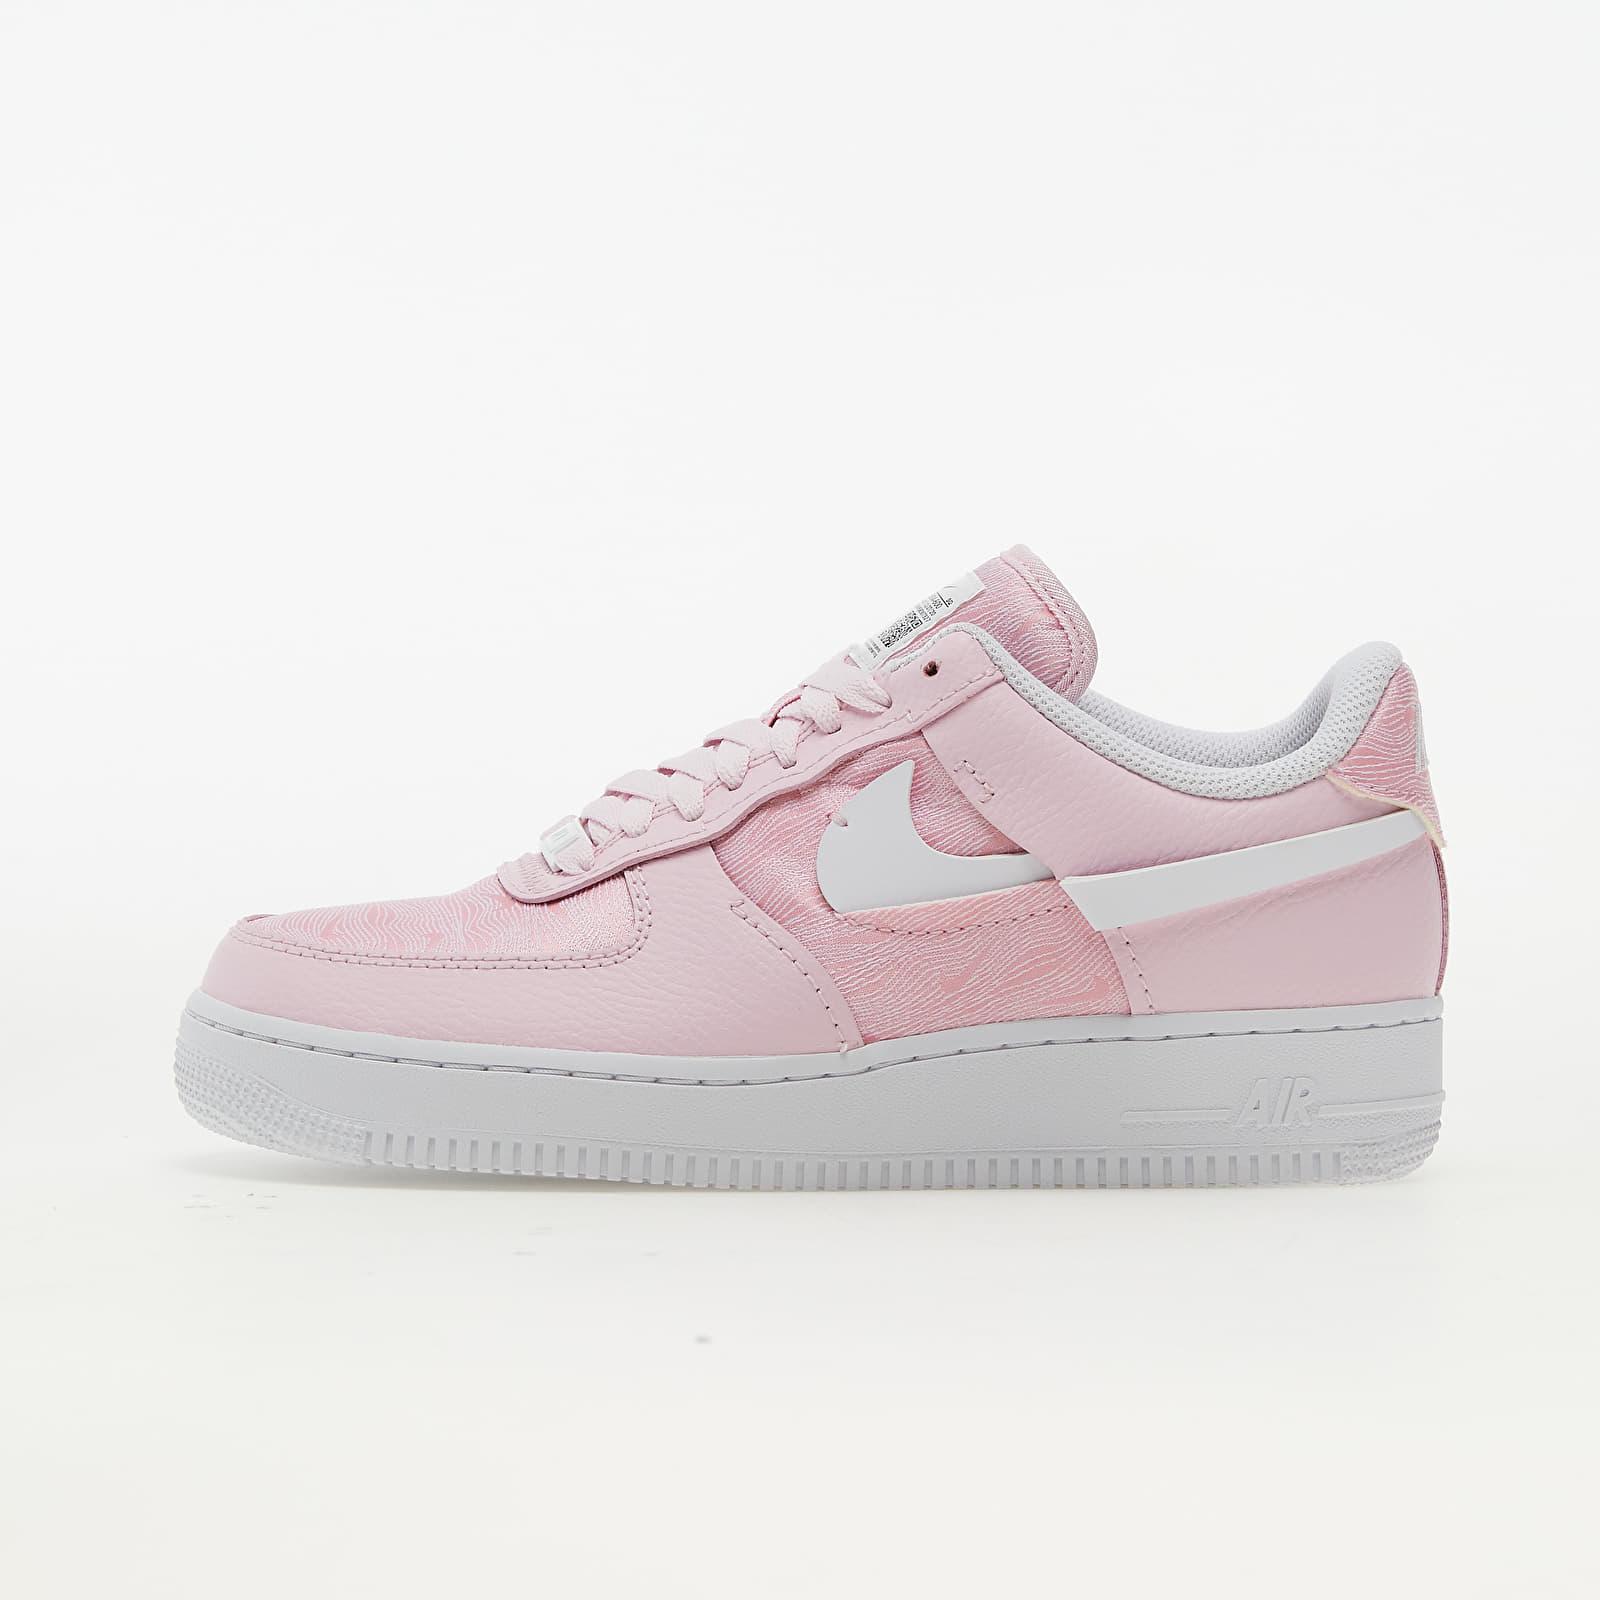 Nike Wmns Air Force 1 LXX Pink Foam / White-Black DJ6904-600